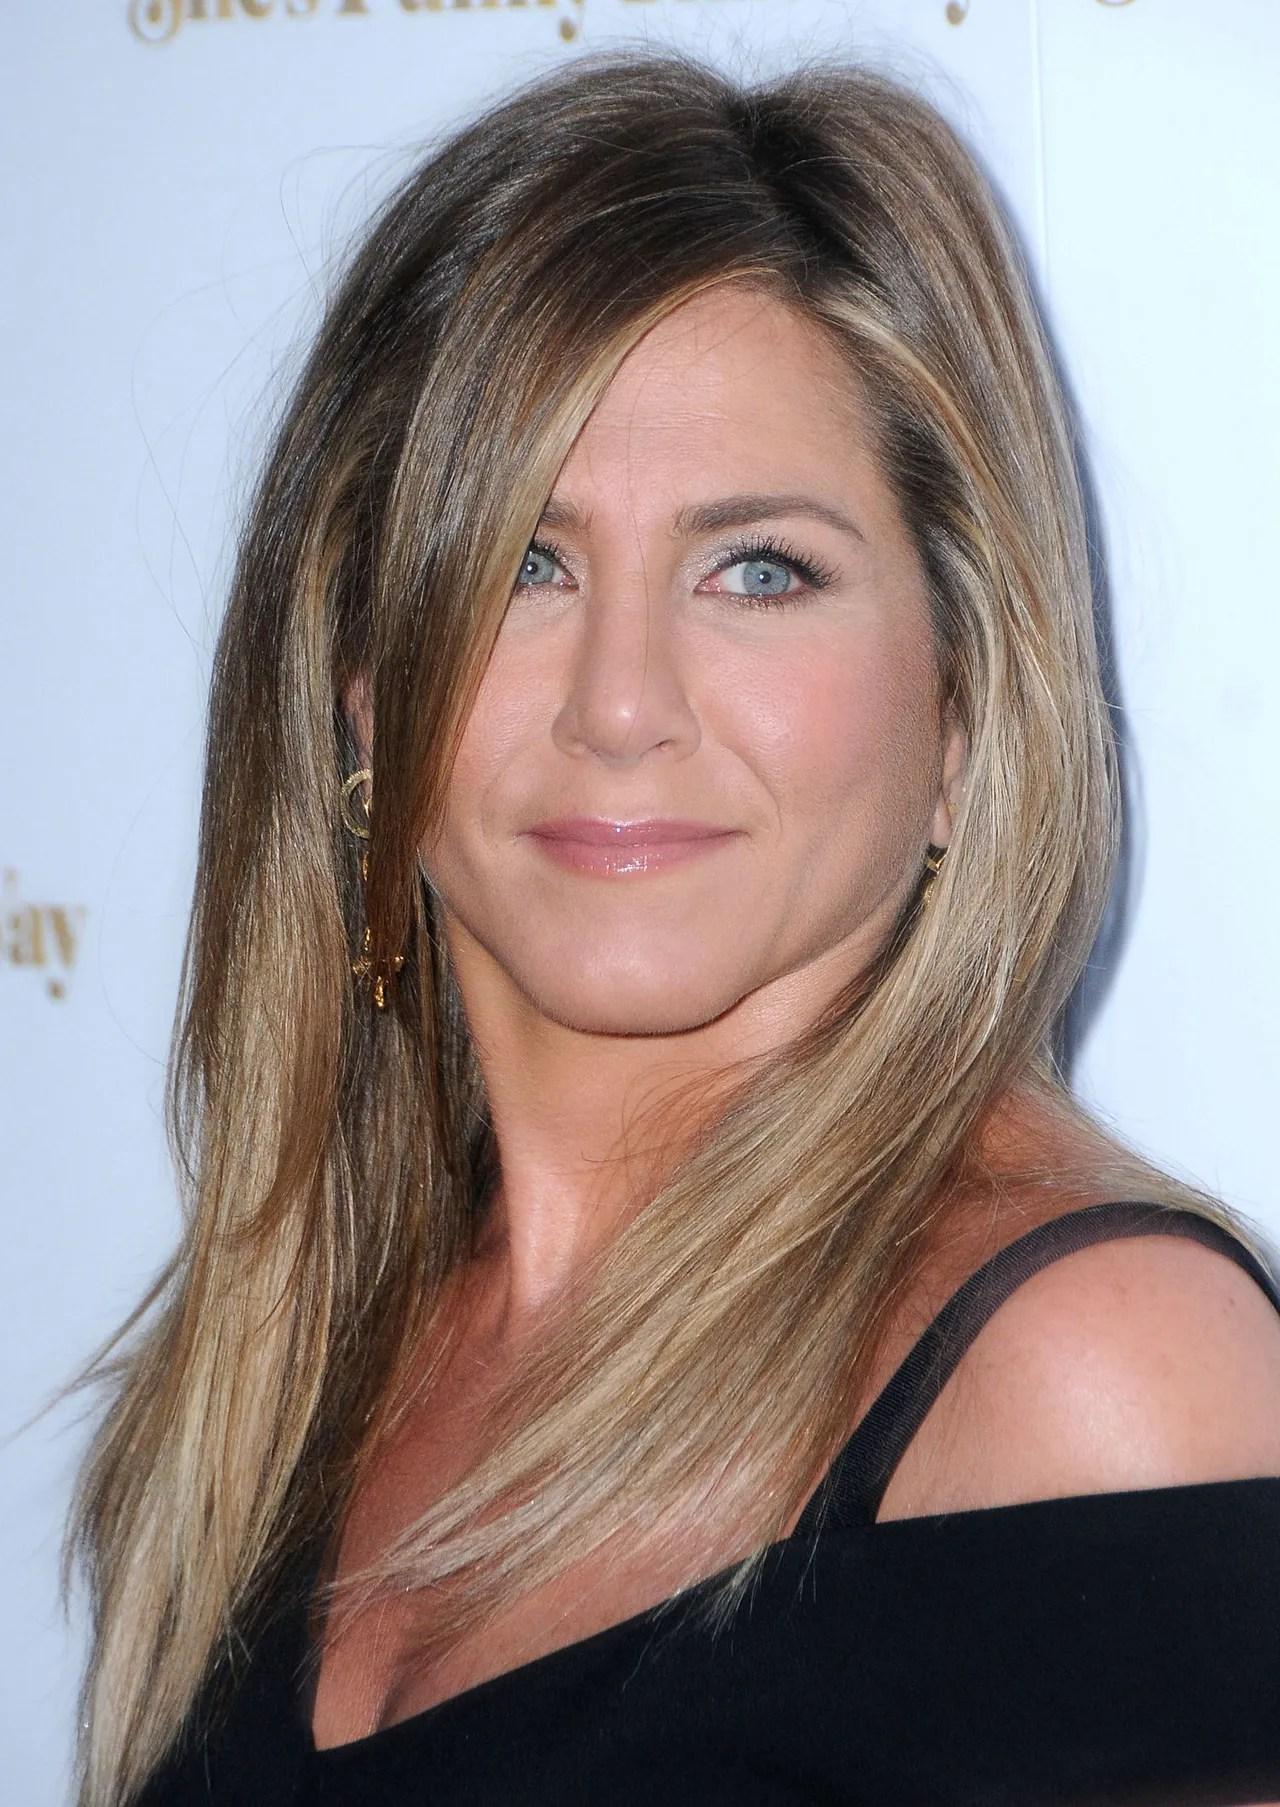 Jennifer Aniston Wears Bronze Eyeliner on Her First Post Wedding Red